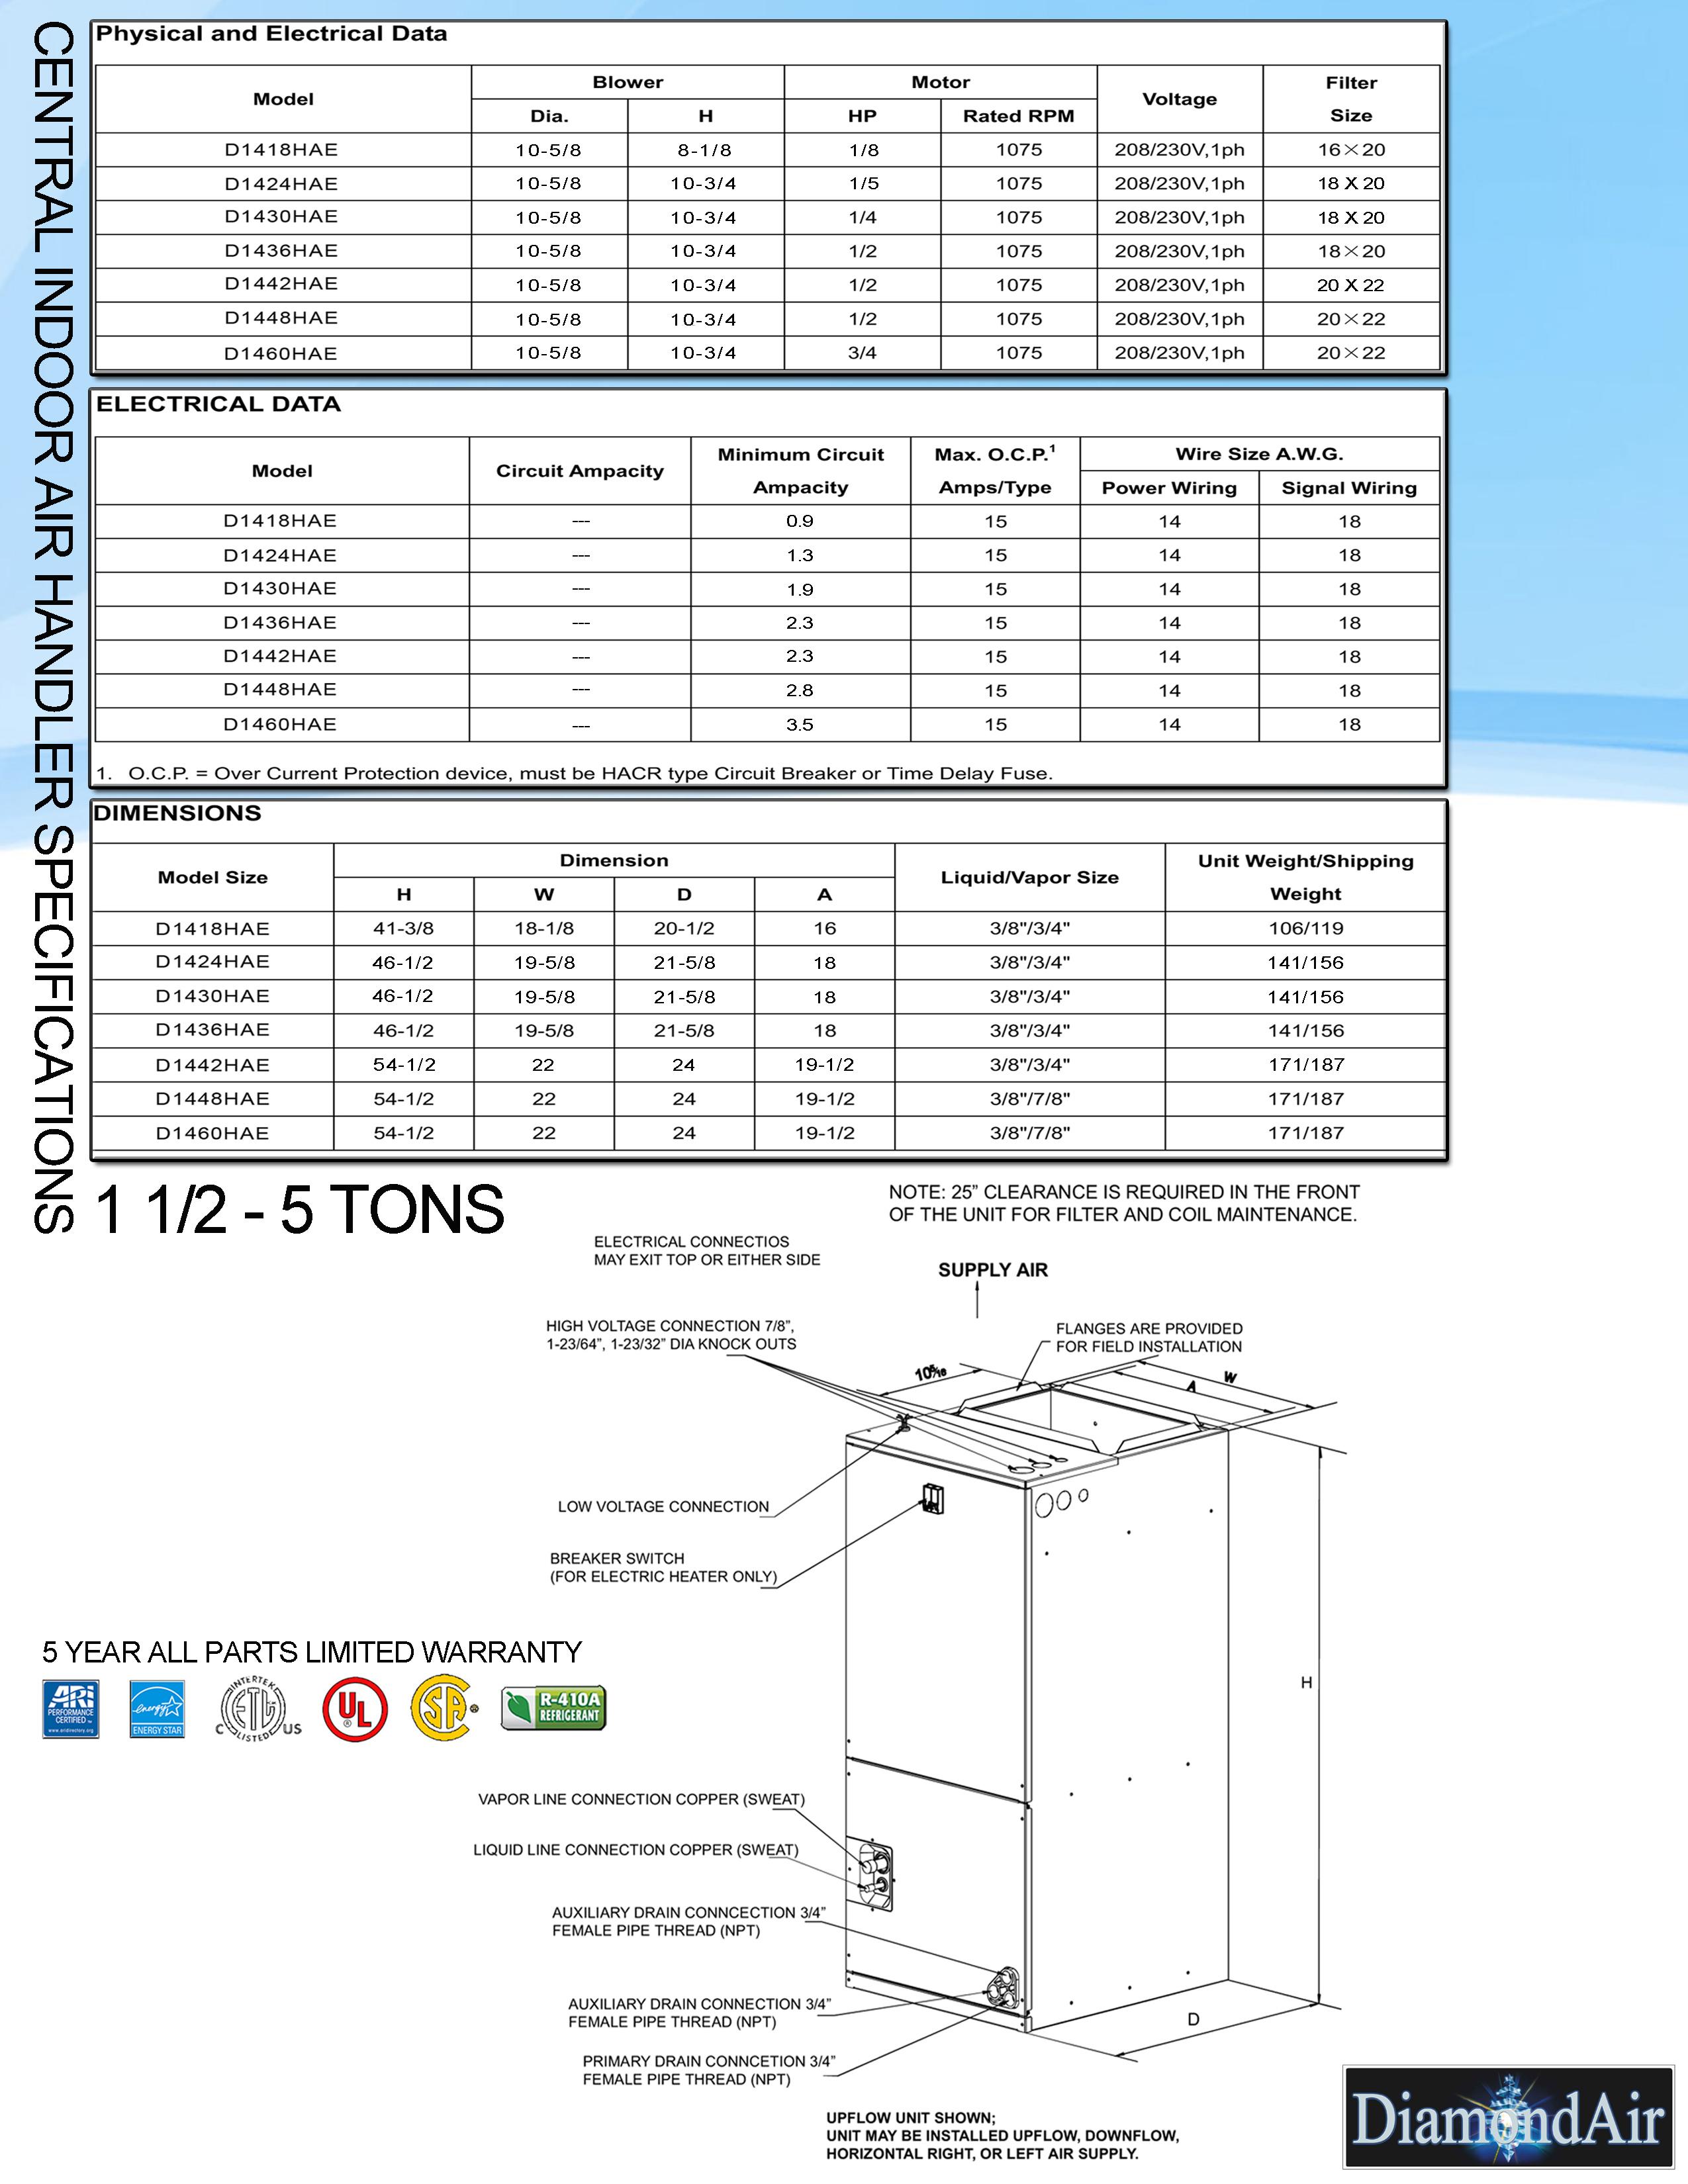 Nordyne heat pump wiring diagram gantt chart in visio nordyne heat pump wiring diagram nordyne heat pump thermostat da20air20handler20specs202015 nordyne heat pump wiring diagram nordyne heat pump sciox Choice Image